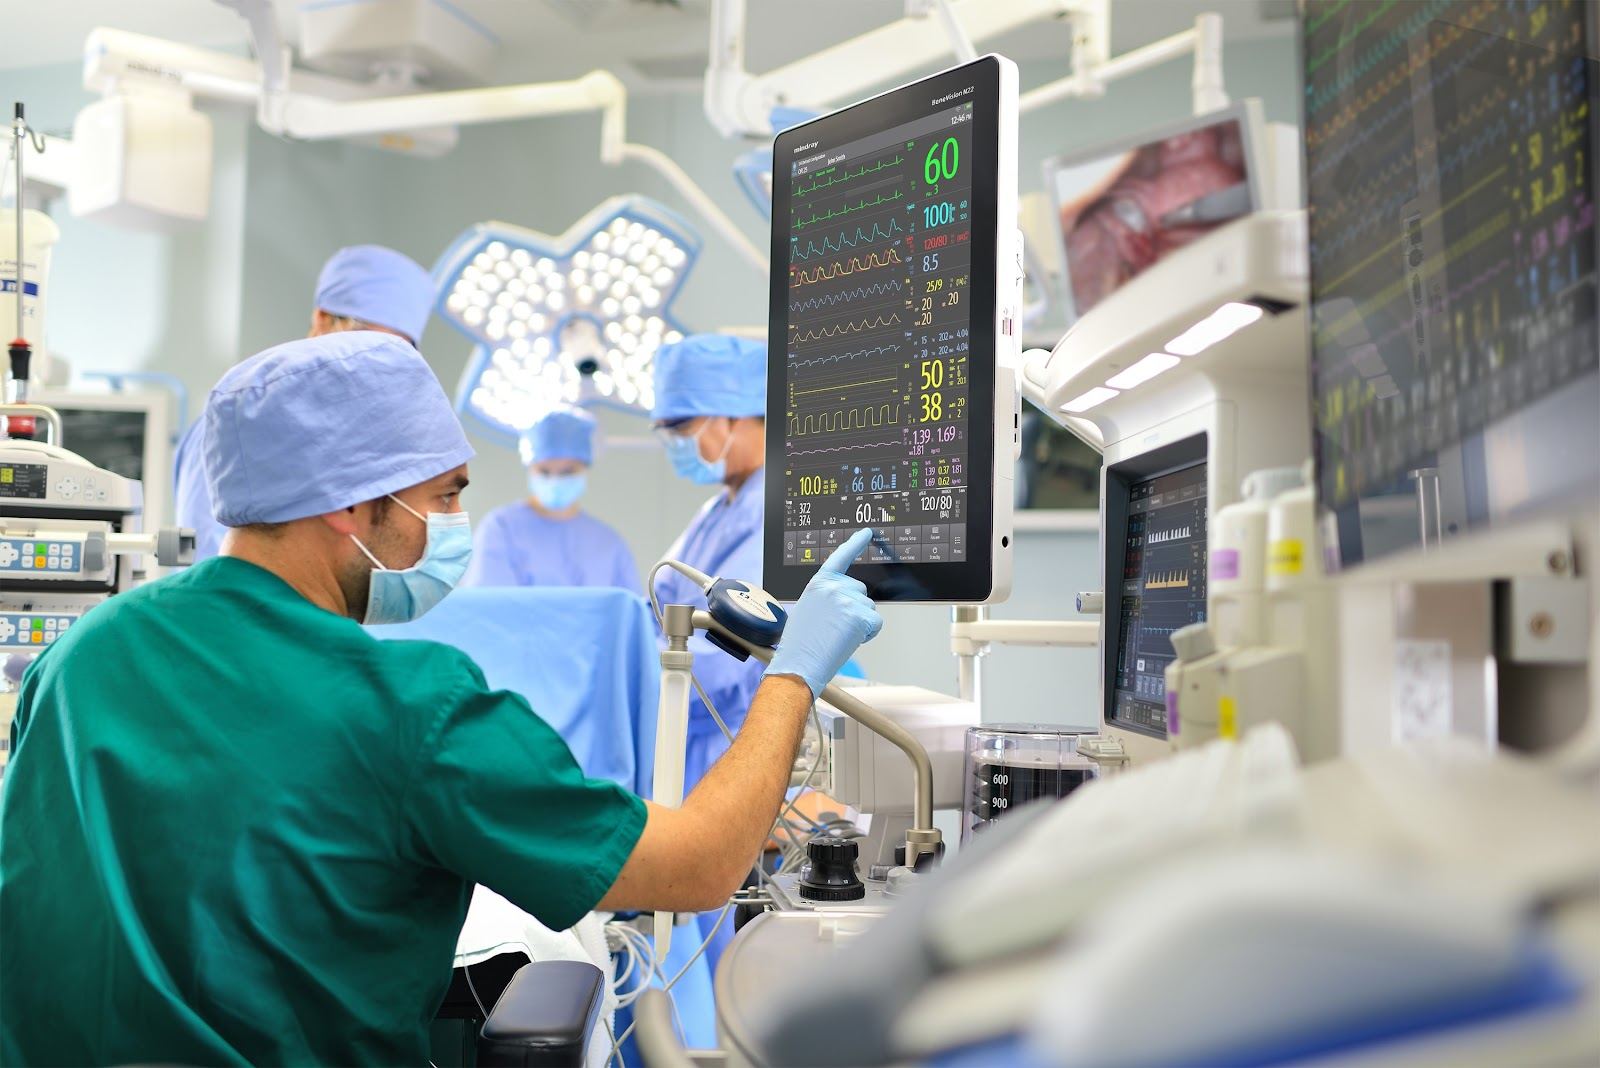 doctor checking operating status